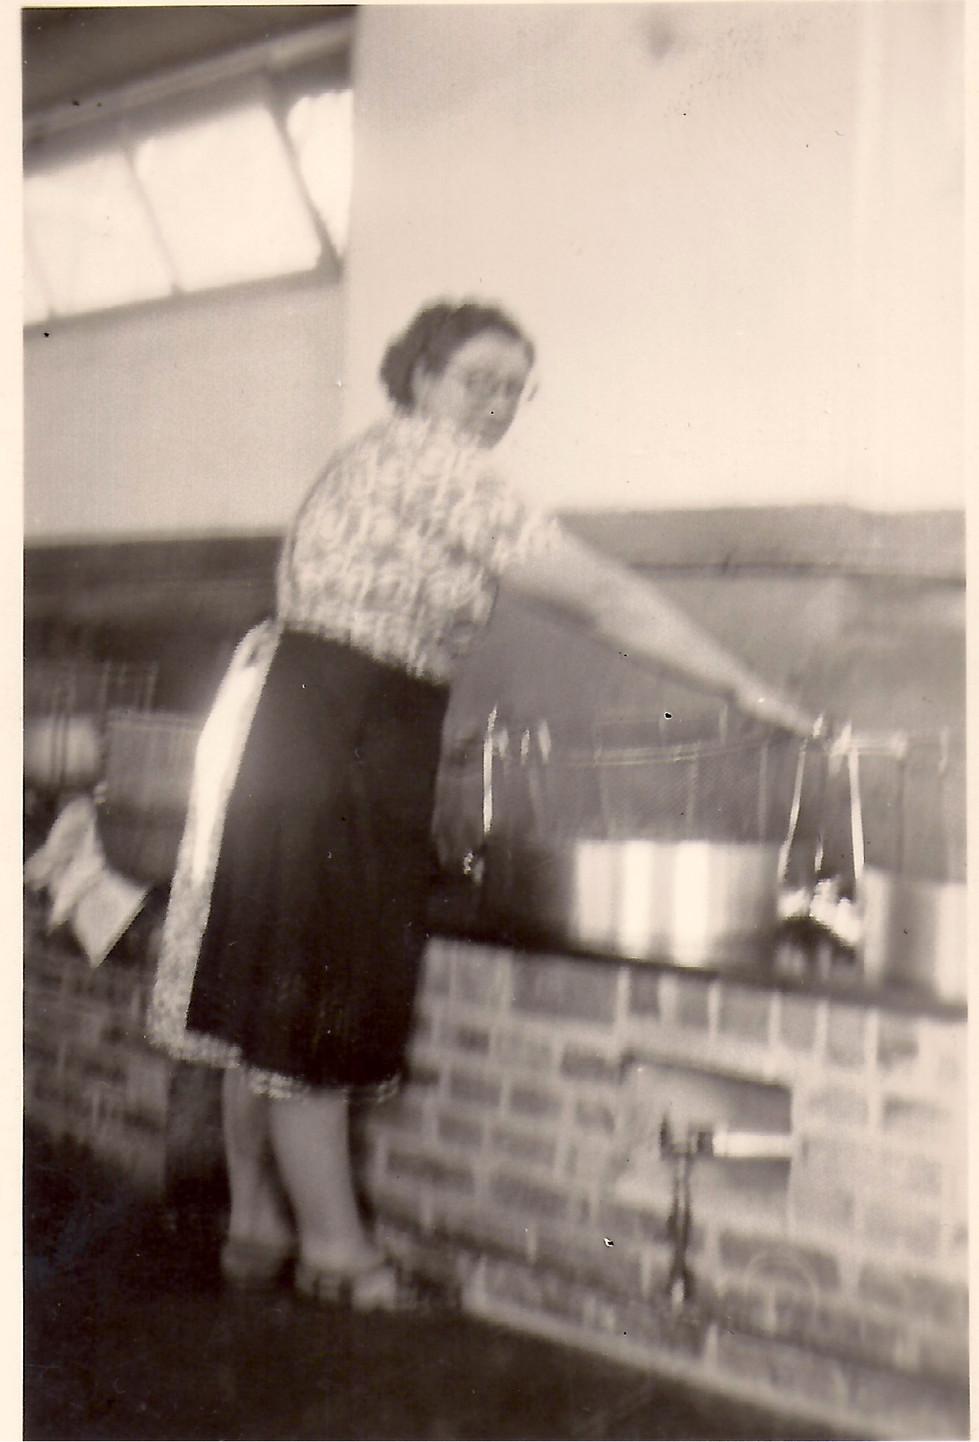 Suzanne Loyson aan frietketel -Odette VH